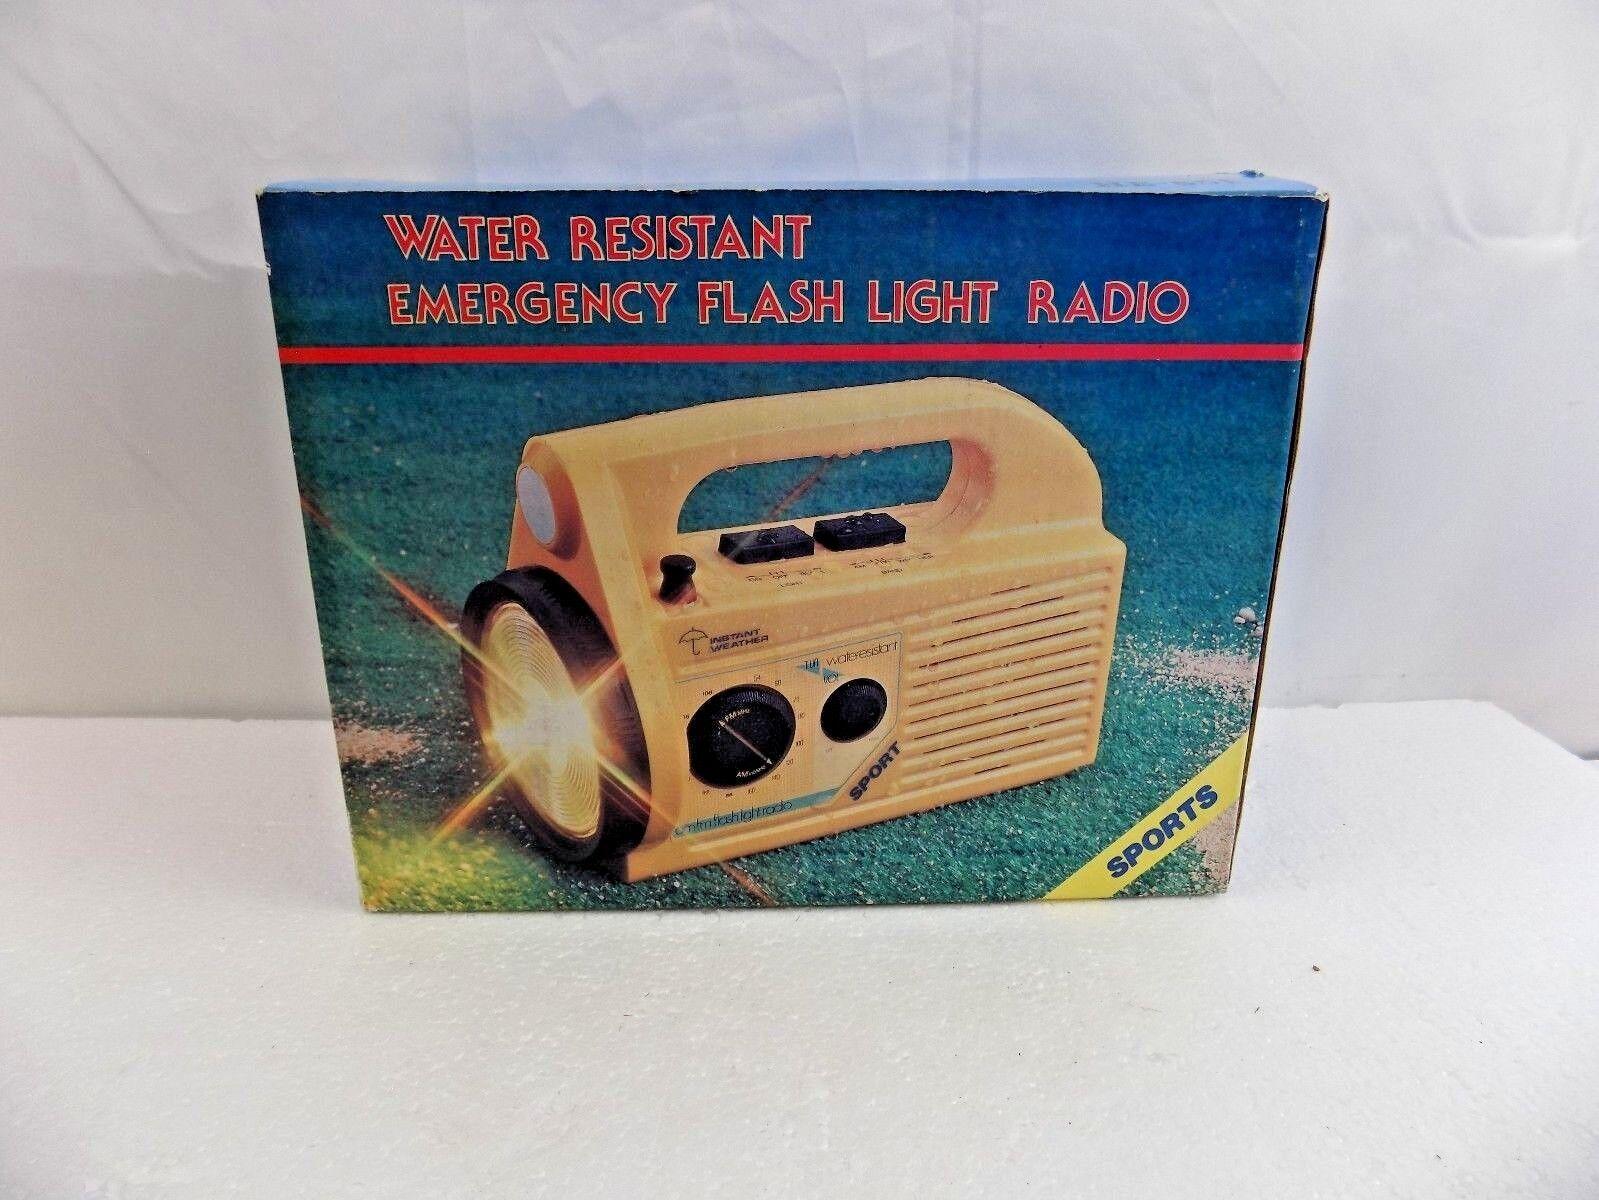 WATER RESISTANT EMERGENCY FLASH LIGHT RADIO - BY HOPESONIC MODEL  HE-851   BOX